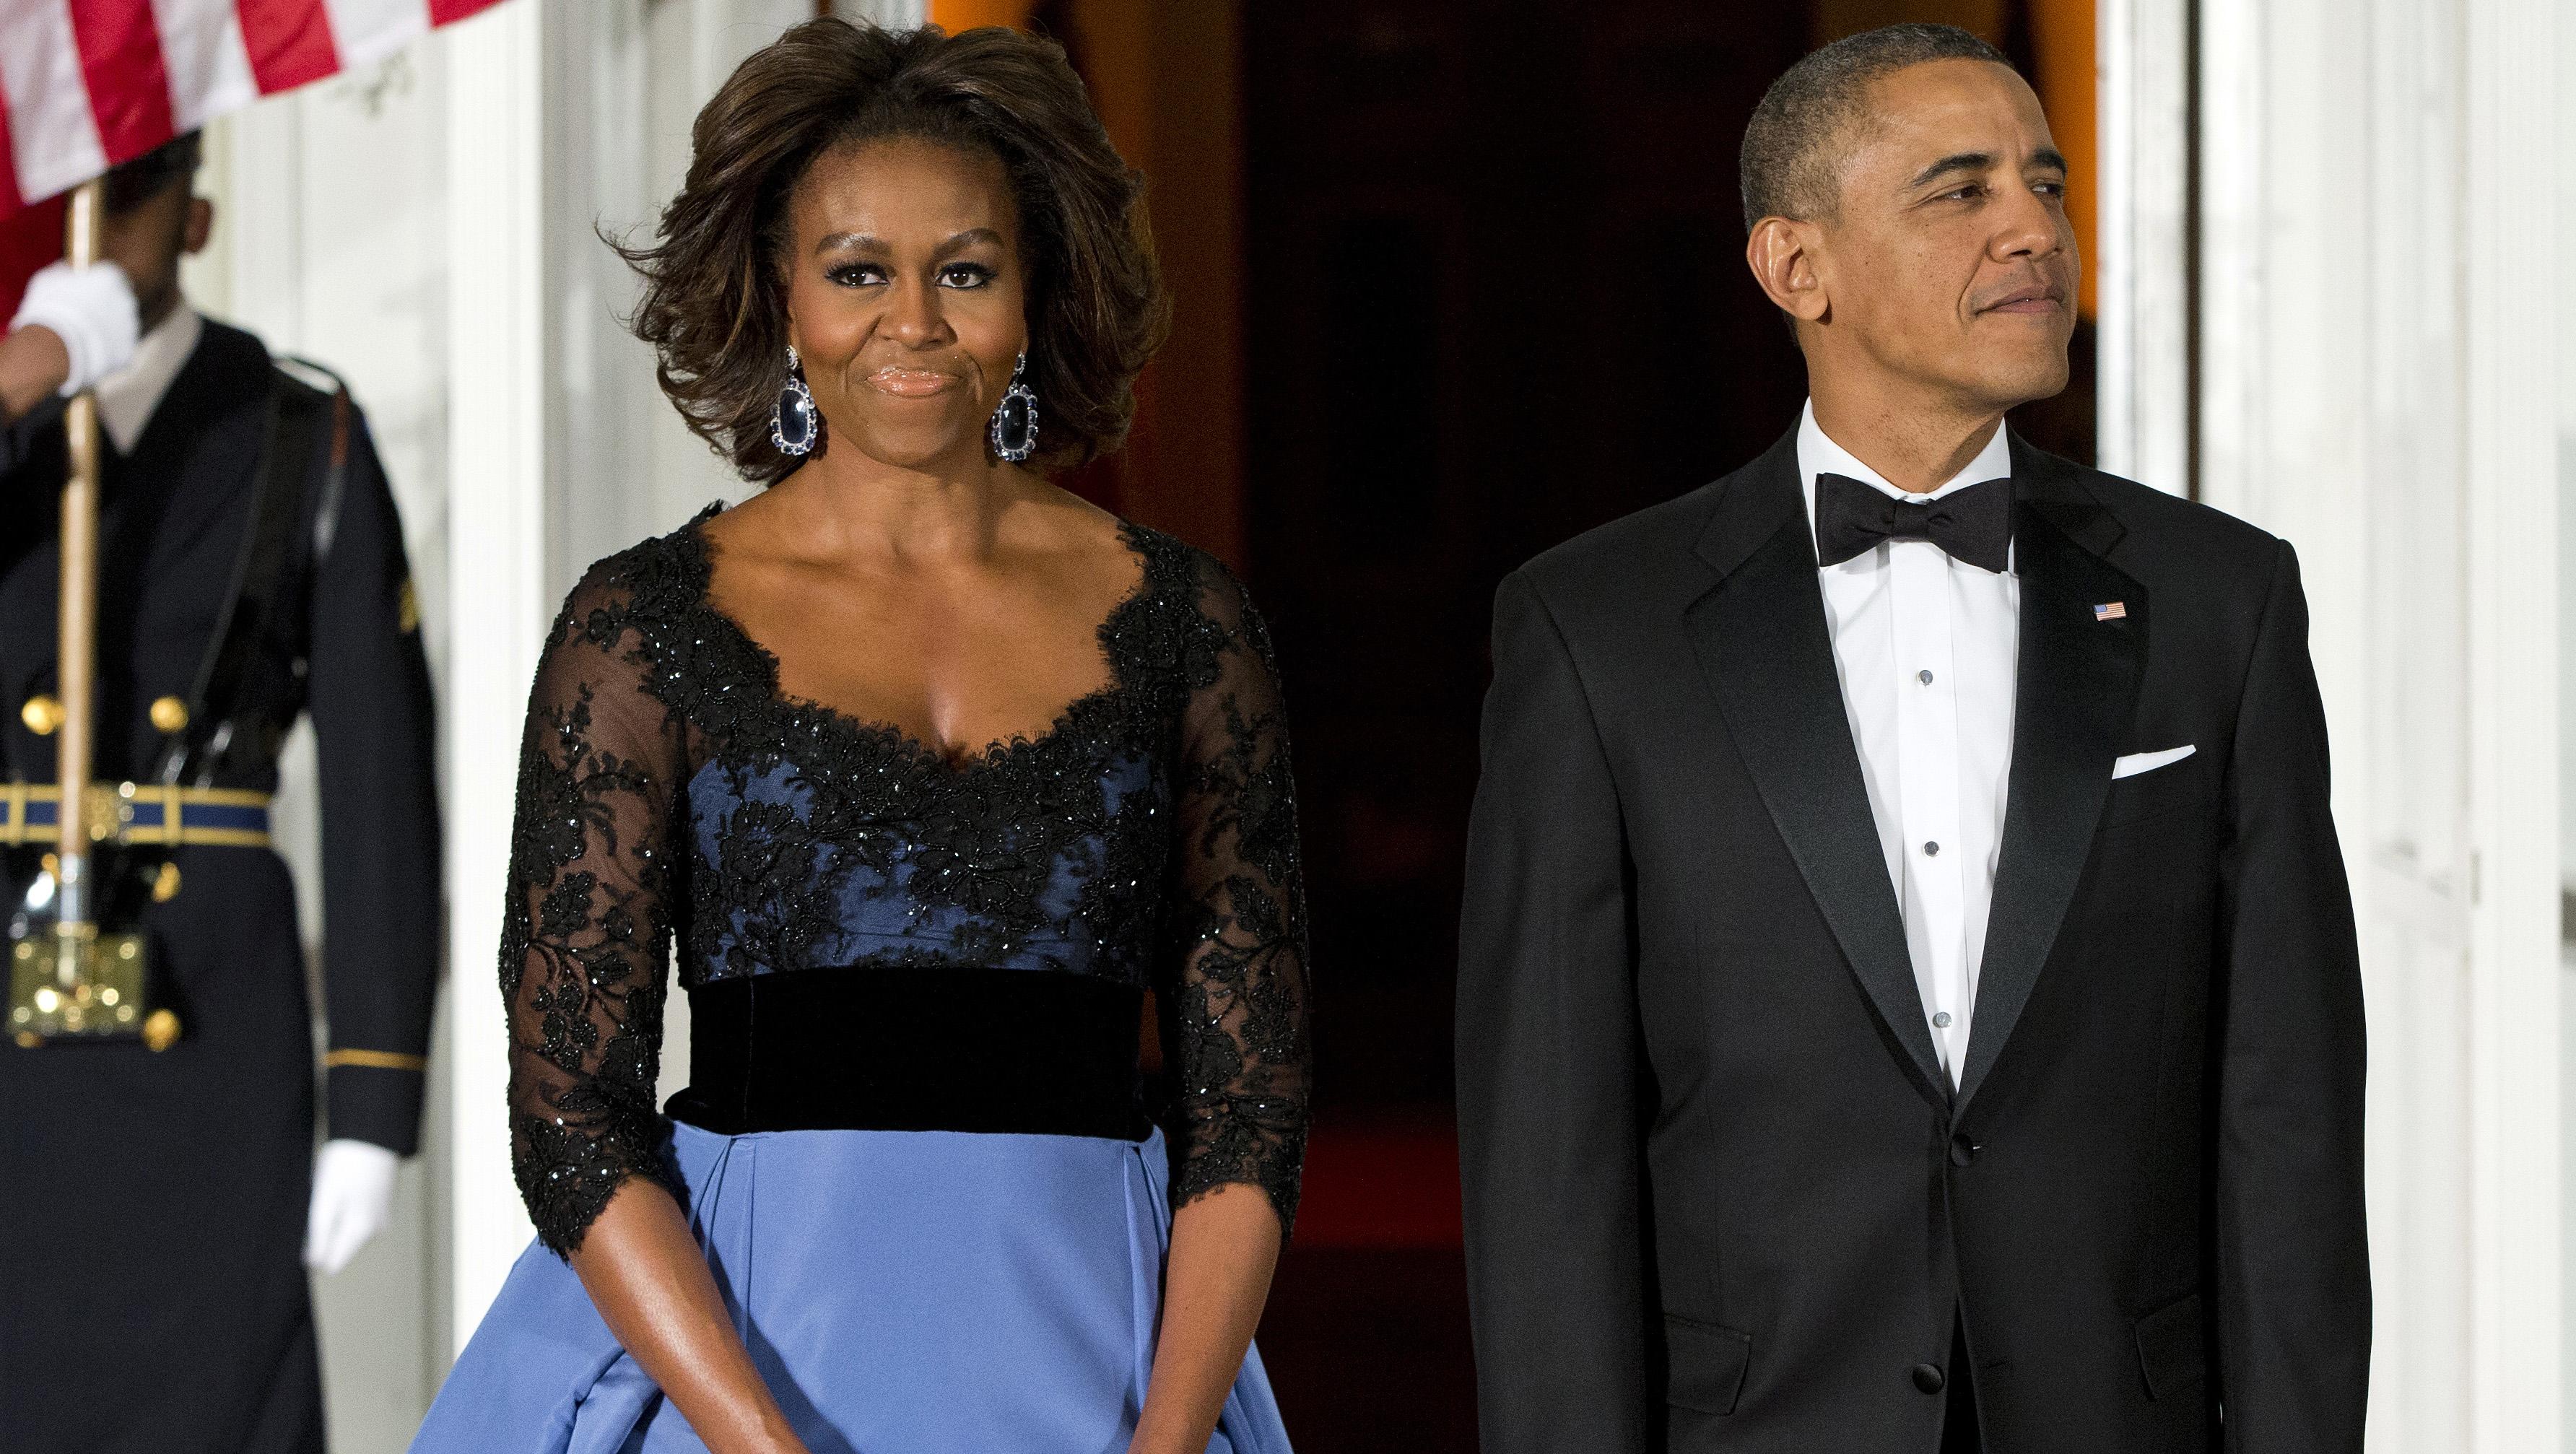 65f0fa0142 Michelle Obama wears Carolina Herrera gown to state dinner - CBS News